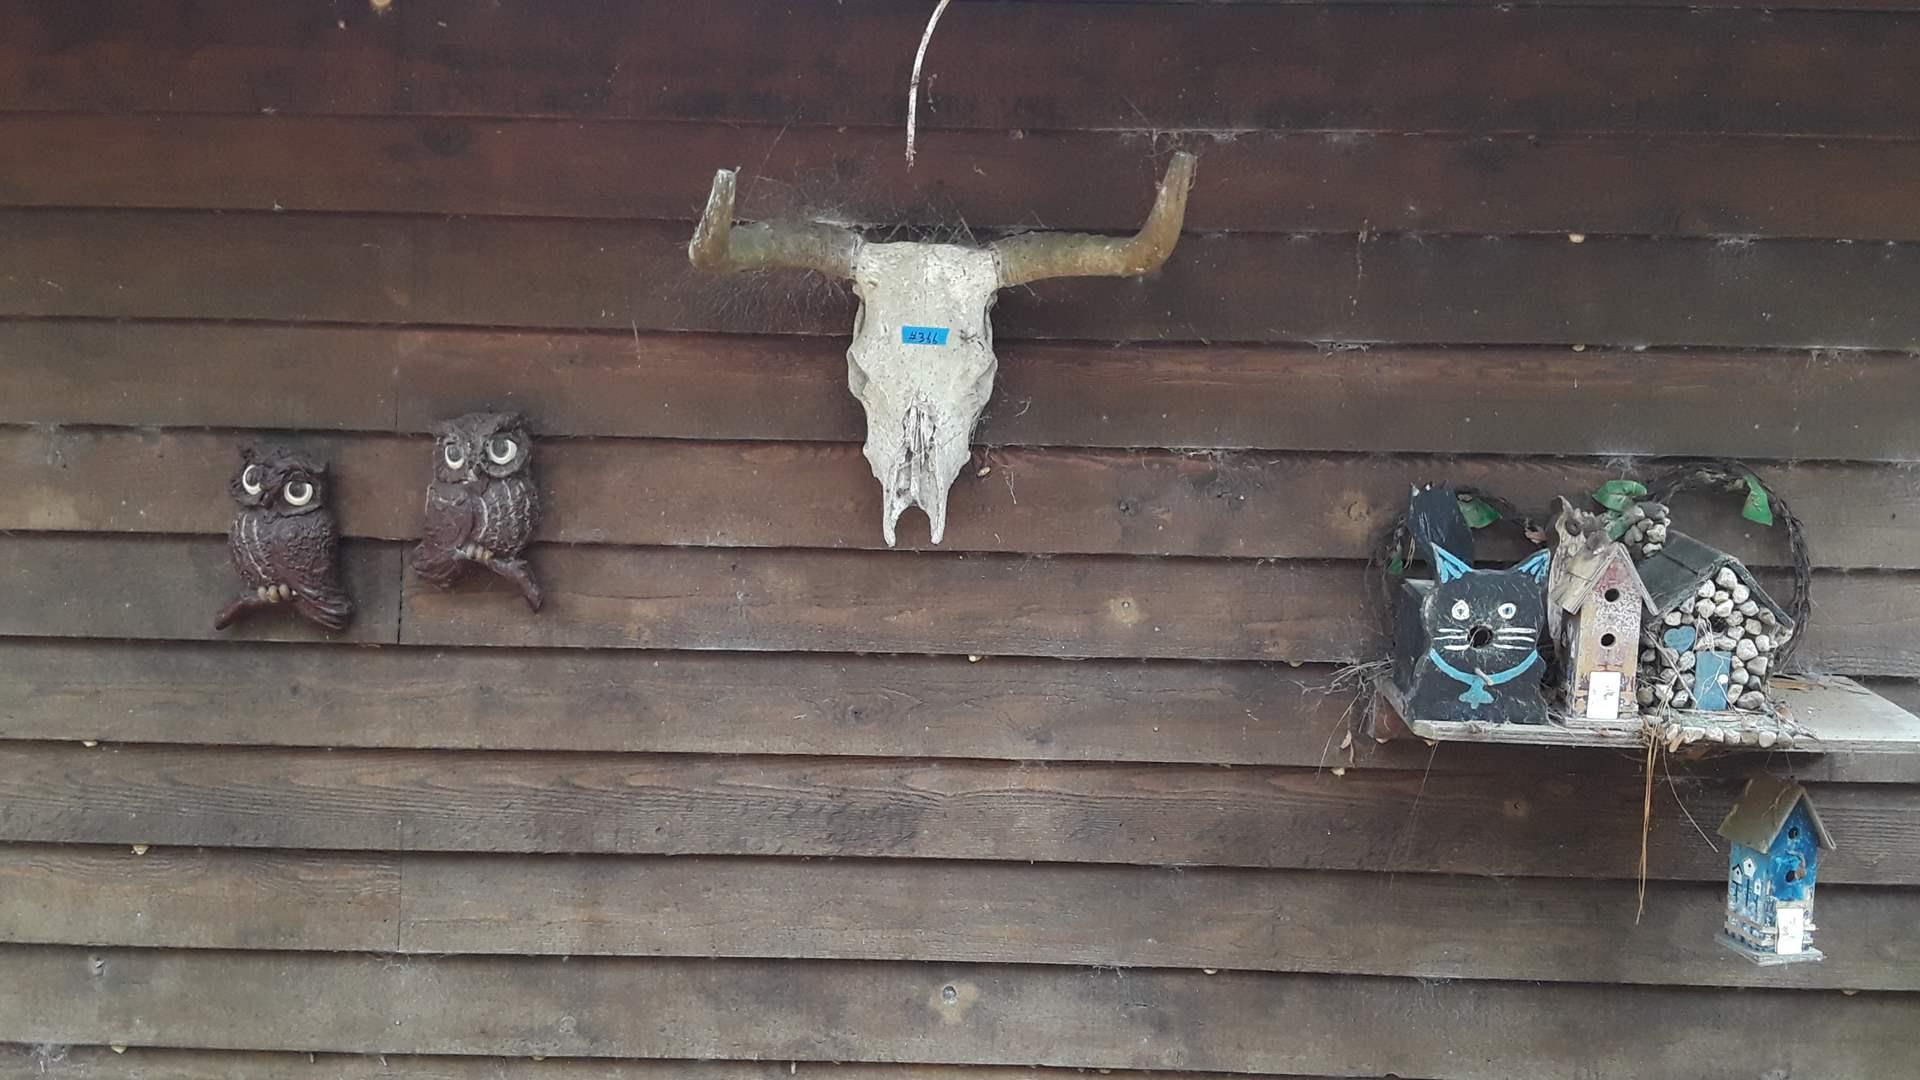 Lot # 366 OUTDOOR DECOR, BULL HORNS, BIRD HOUSES, OWL HANGINGS